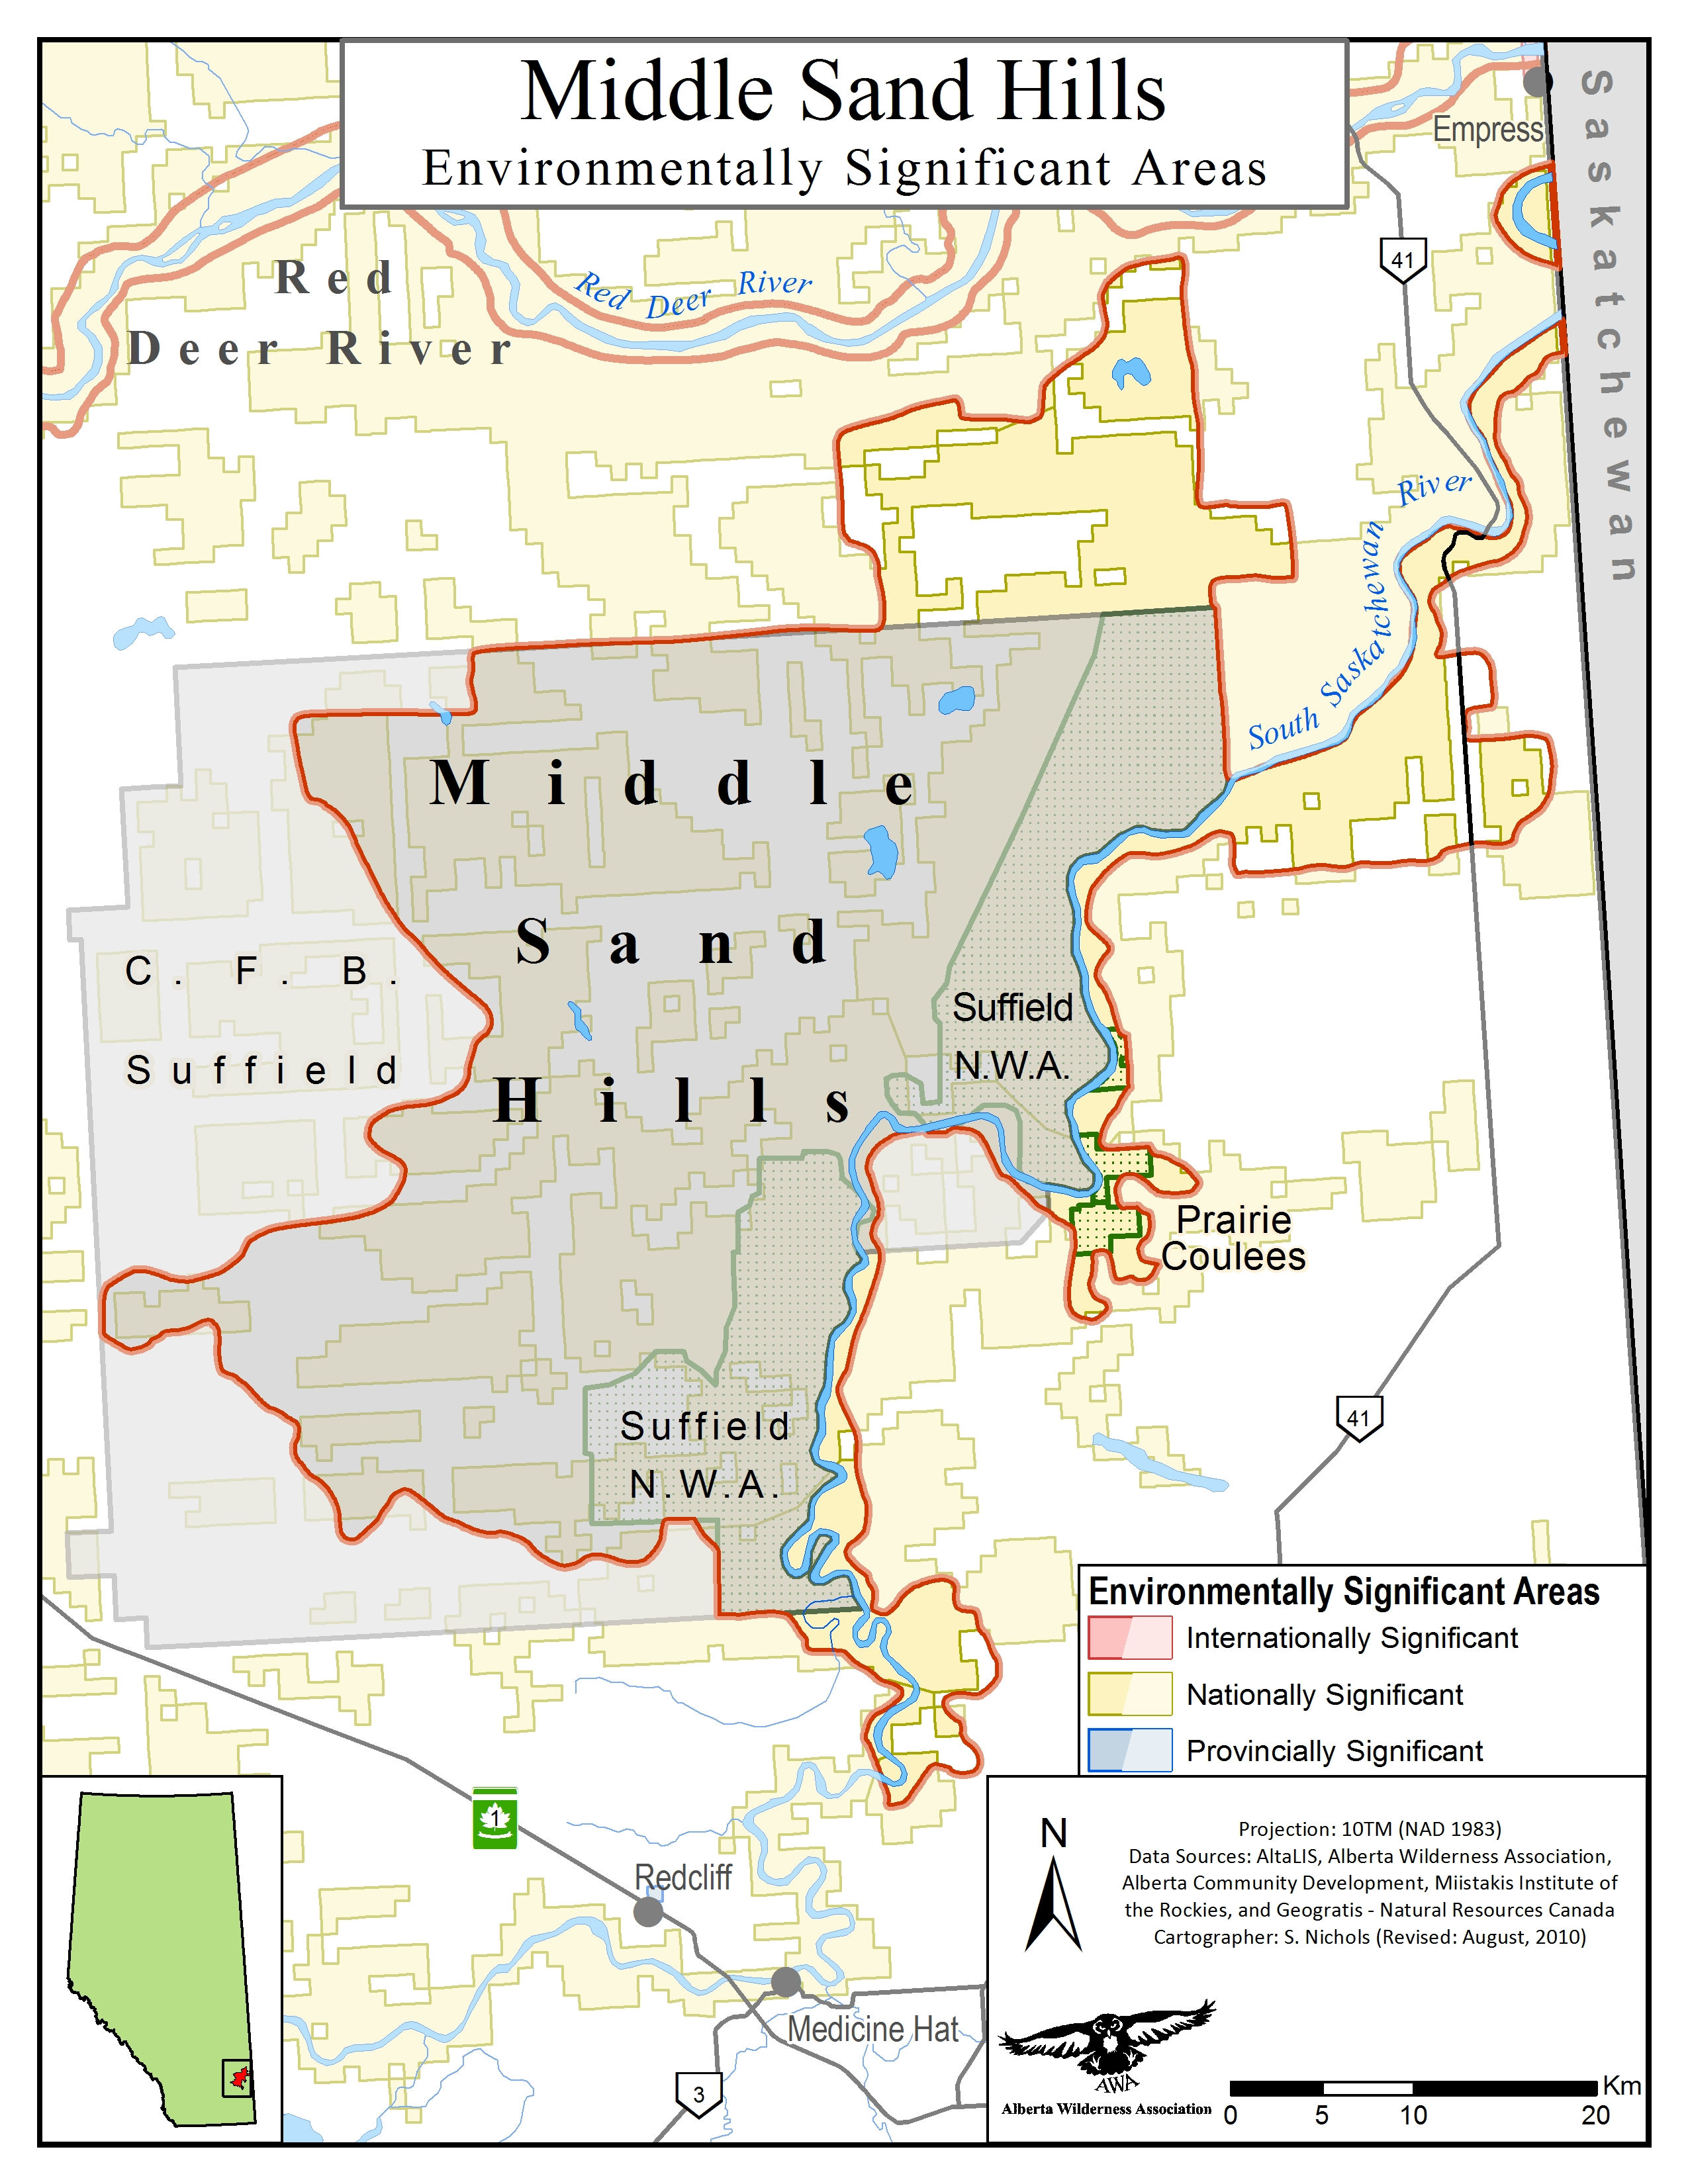 Middle Sand Hills - Alberta Wilderness Association